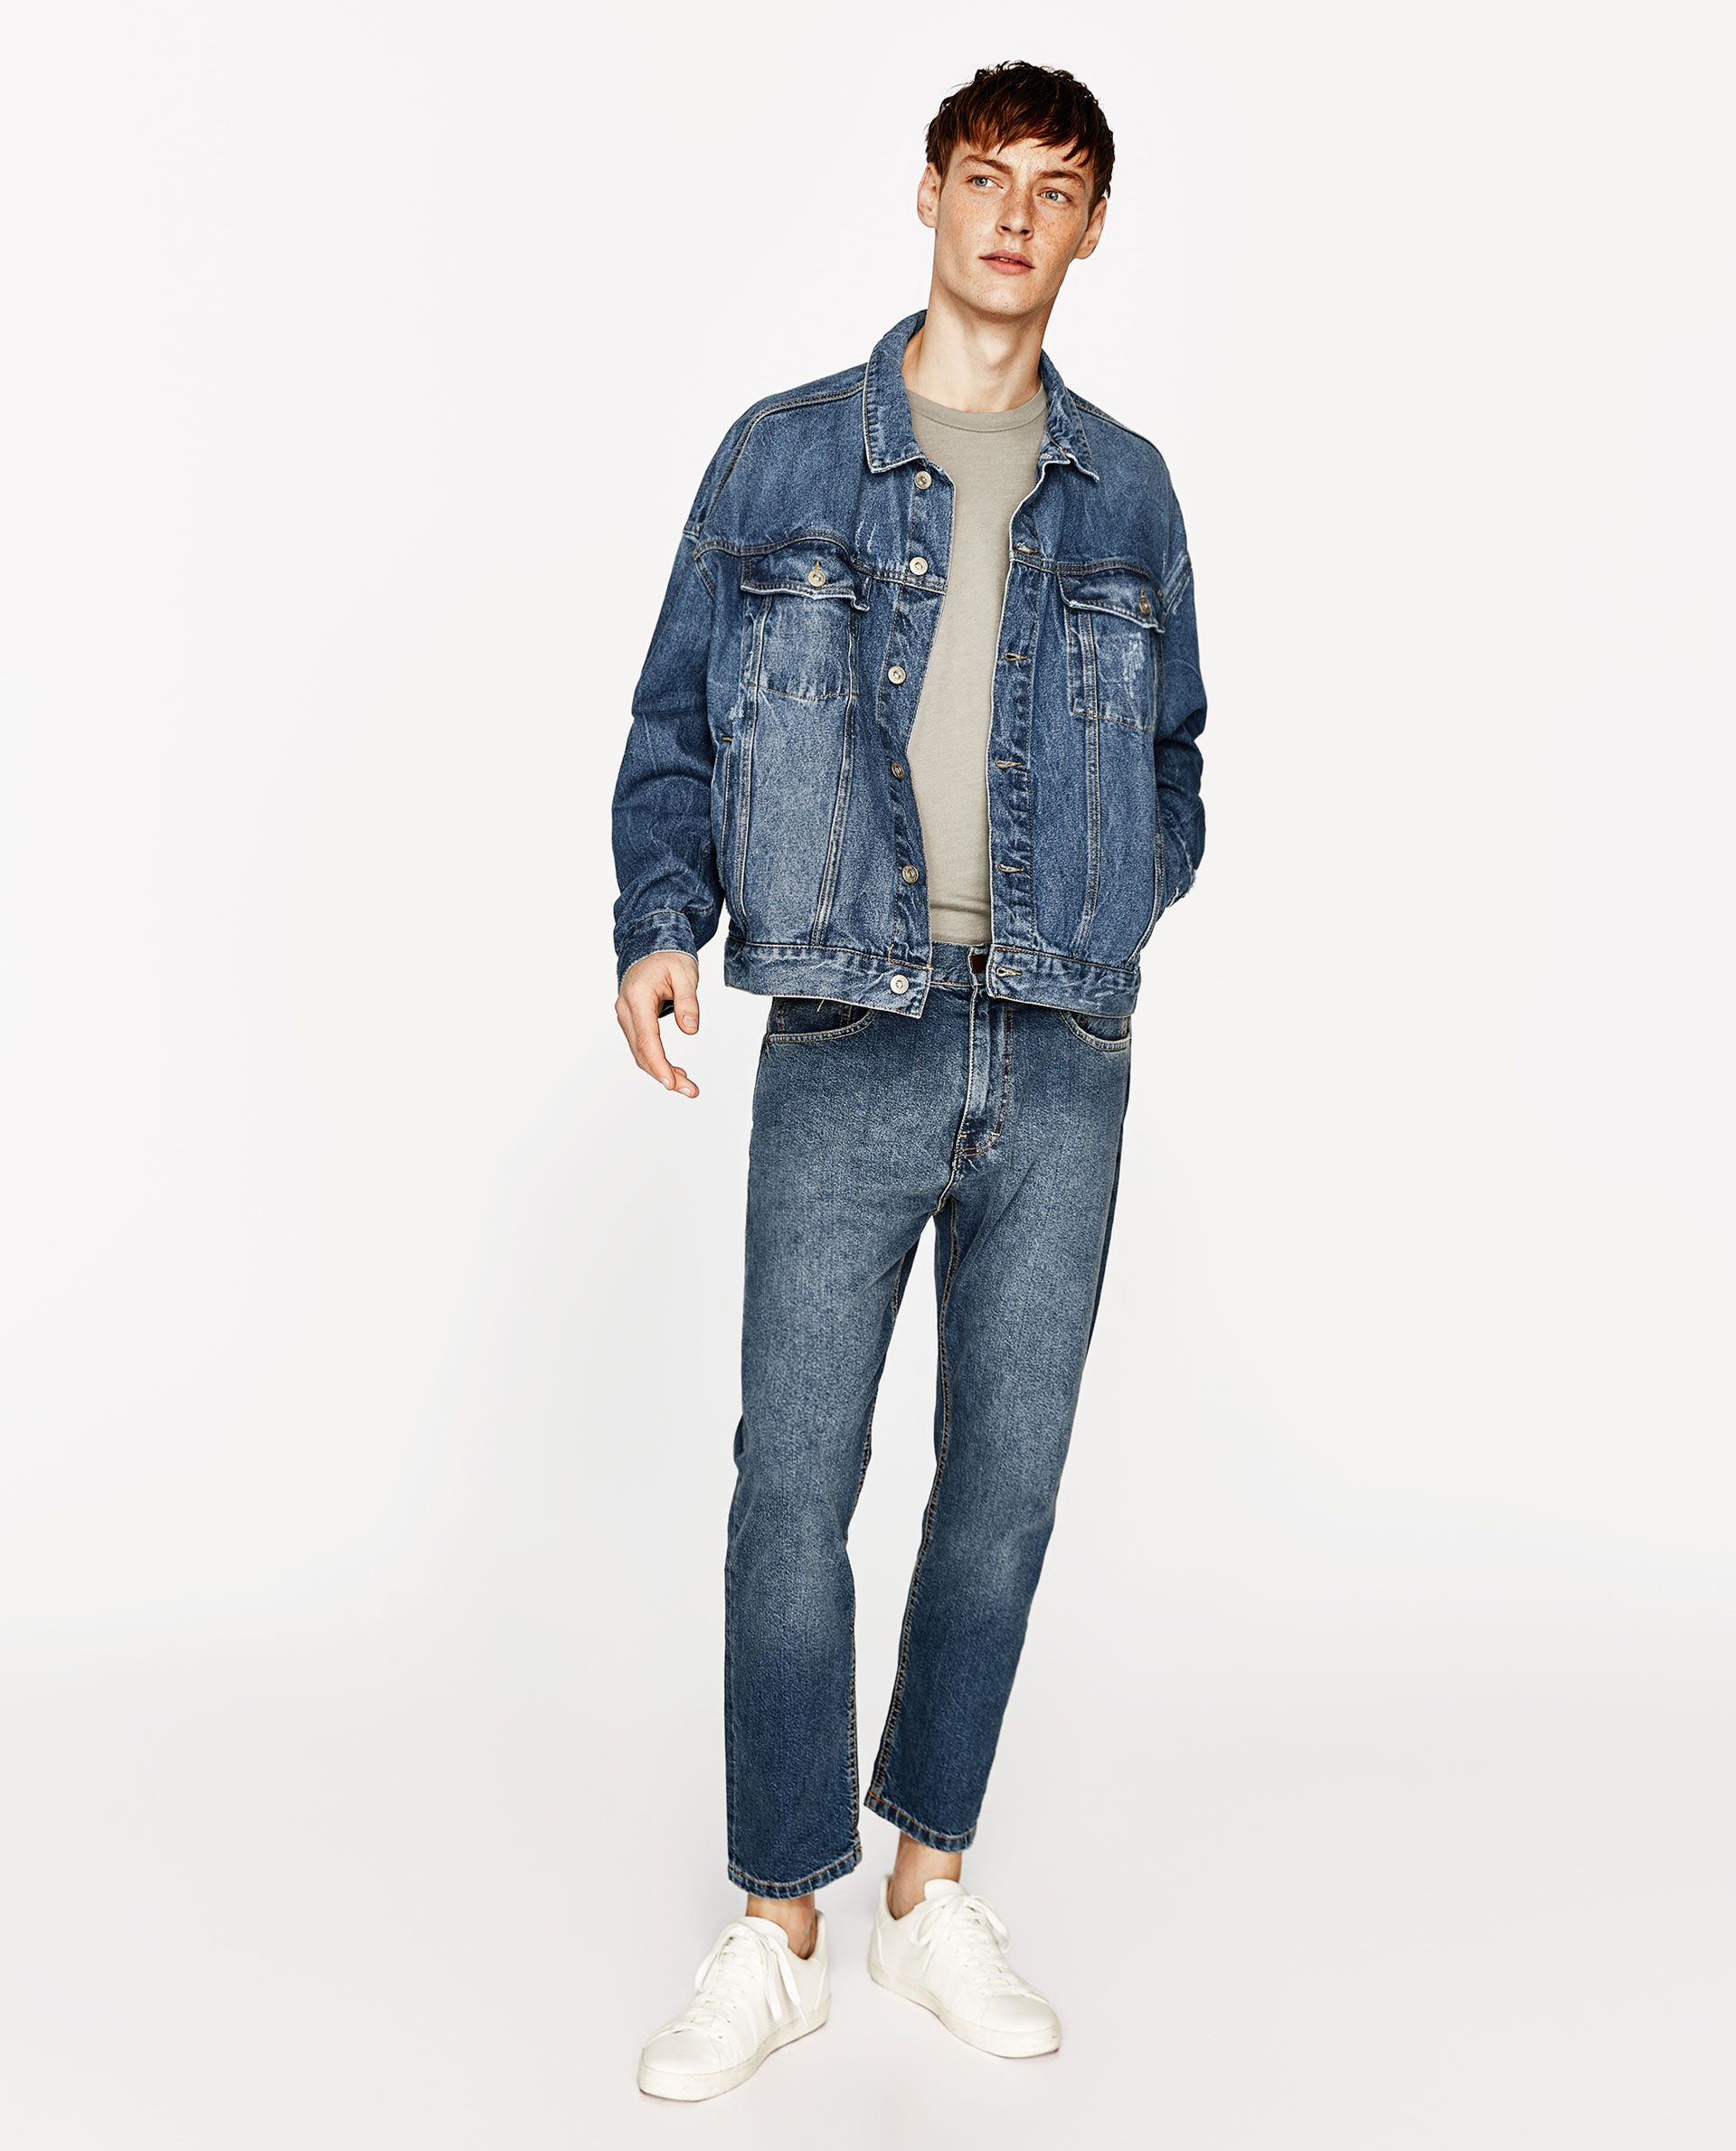 Zara Man Oversized Denim Jacket [ 2379 x 1920 Pixel ]